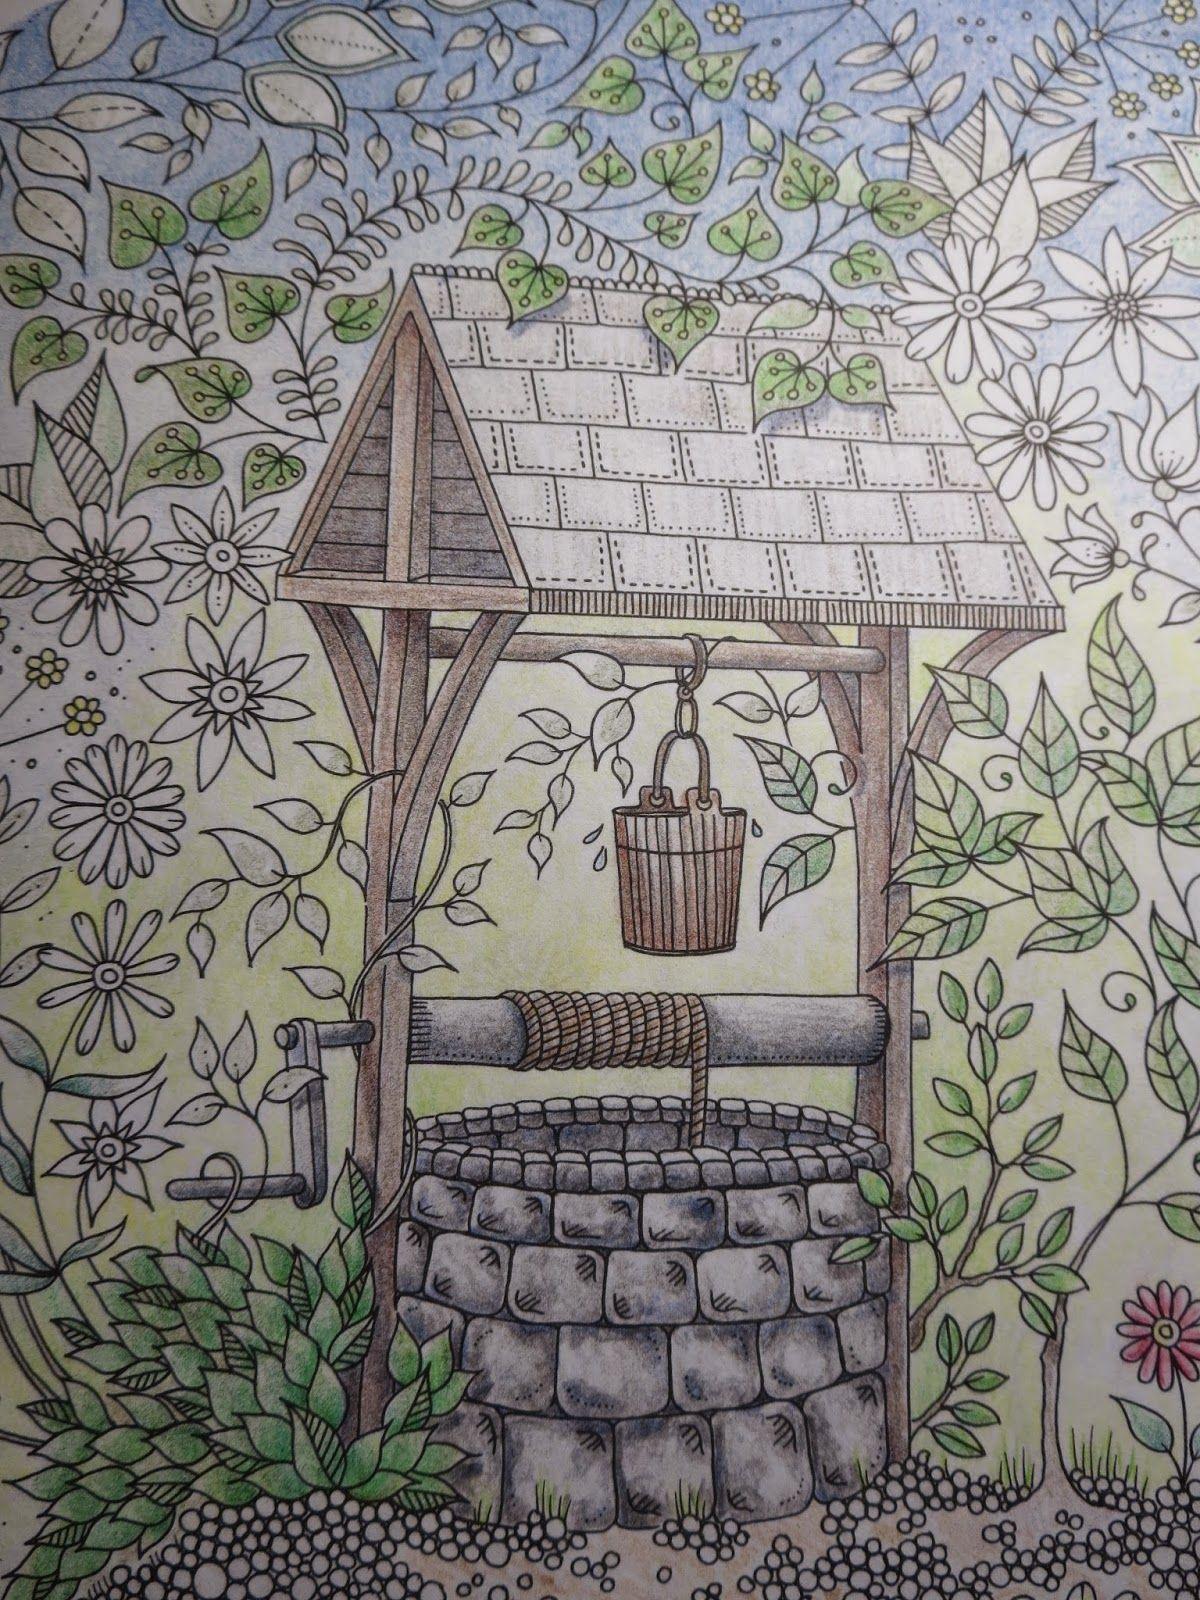 Passion For Pencils My Secret Garden Colouring Book Part 2